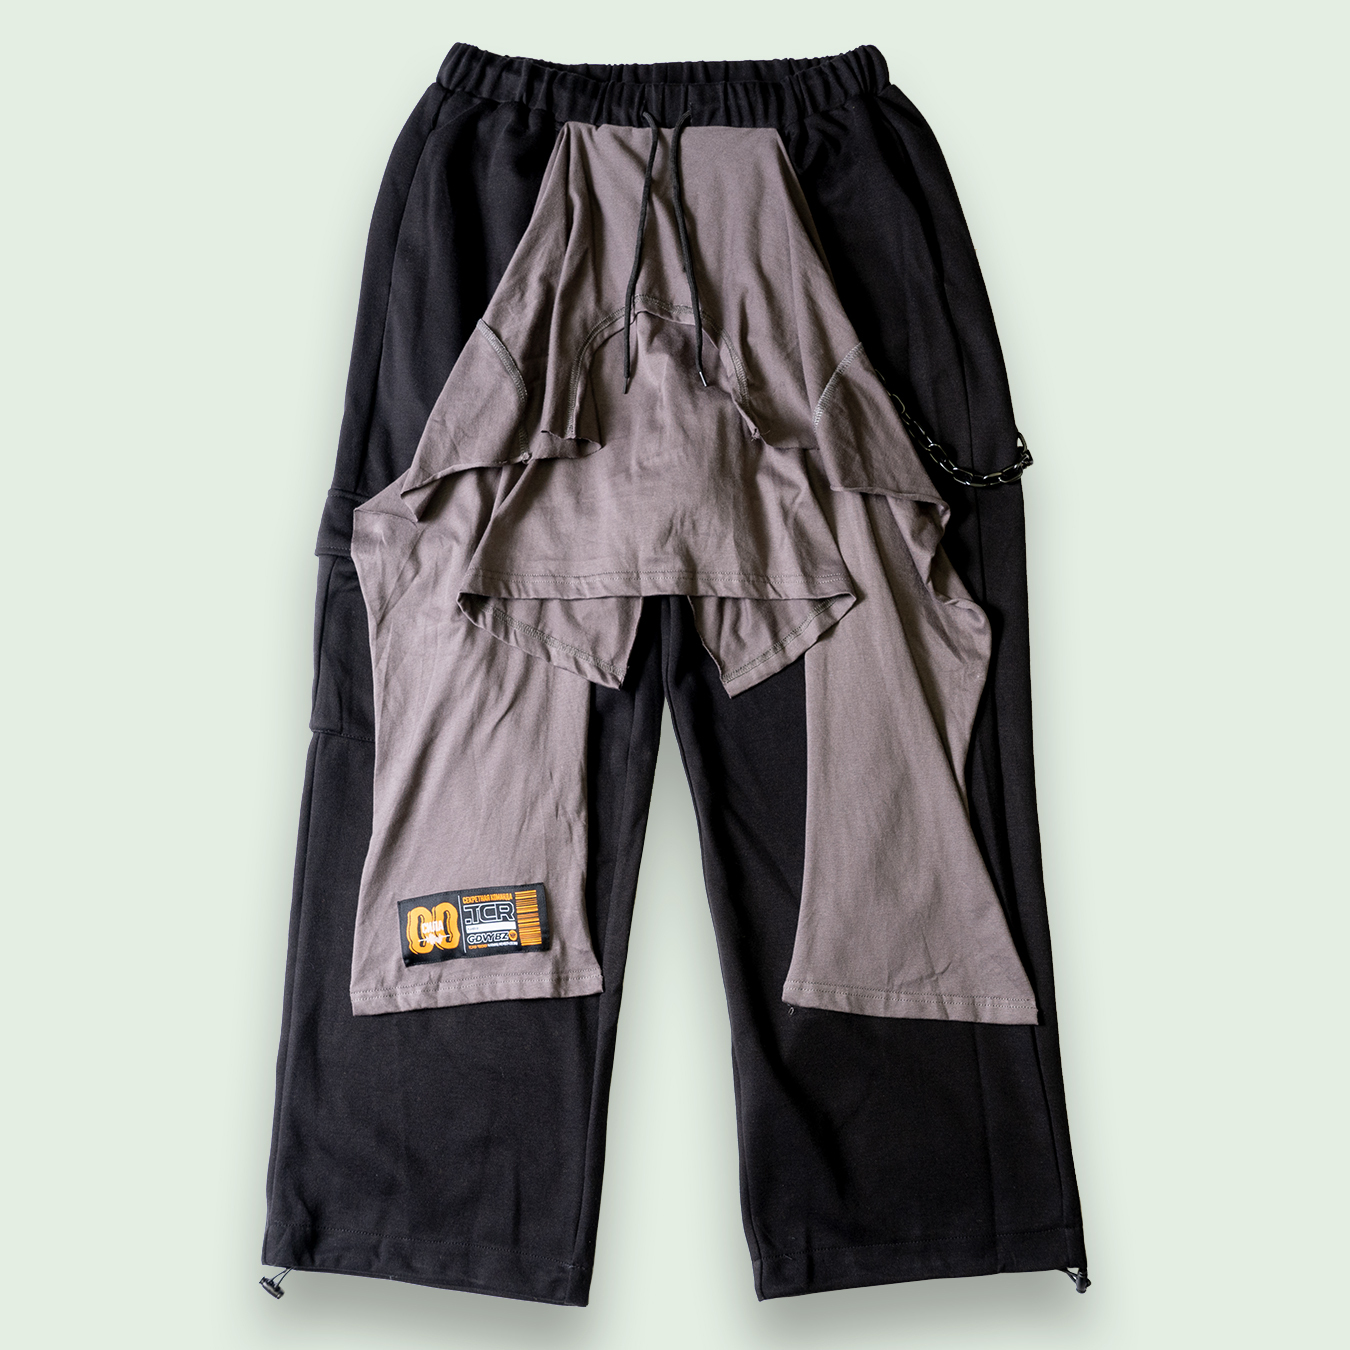 REWORK SWEAT CARGO PANTS - GRAY/BLACK